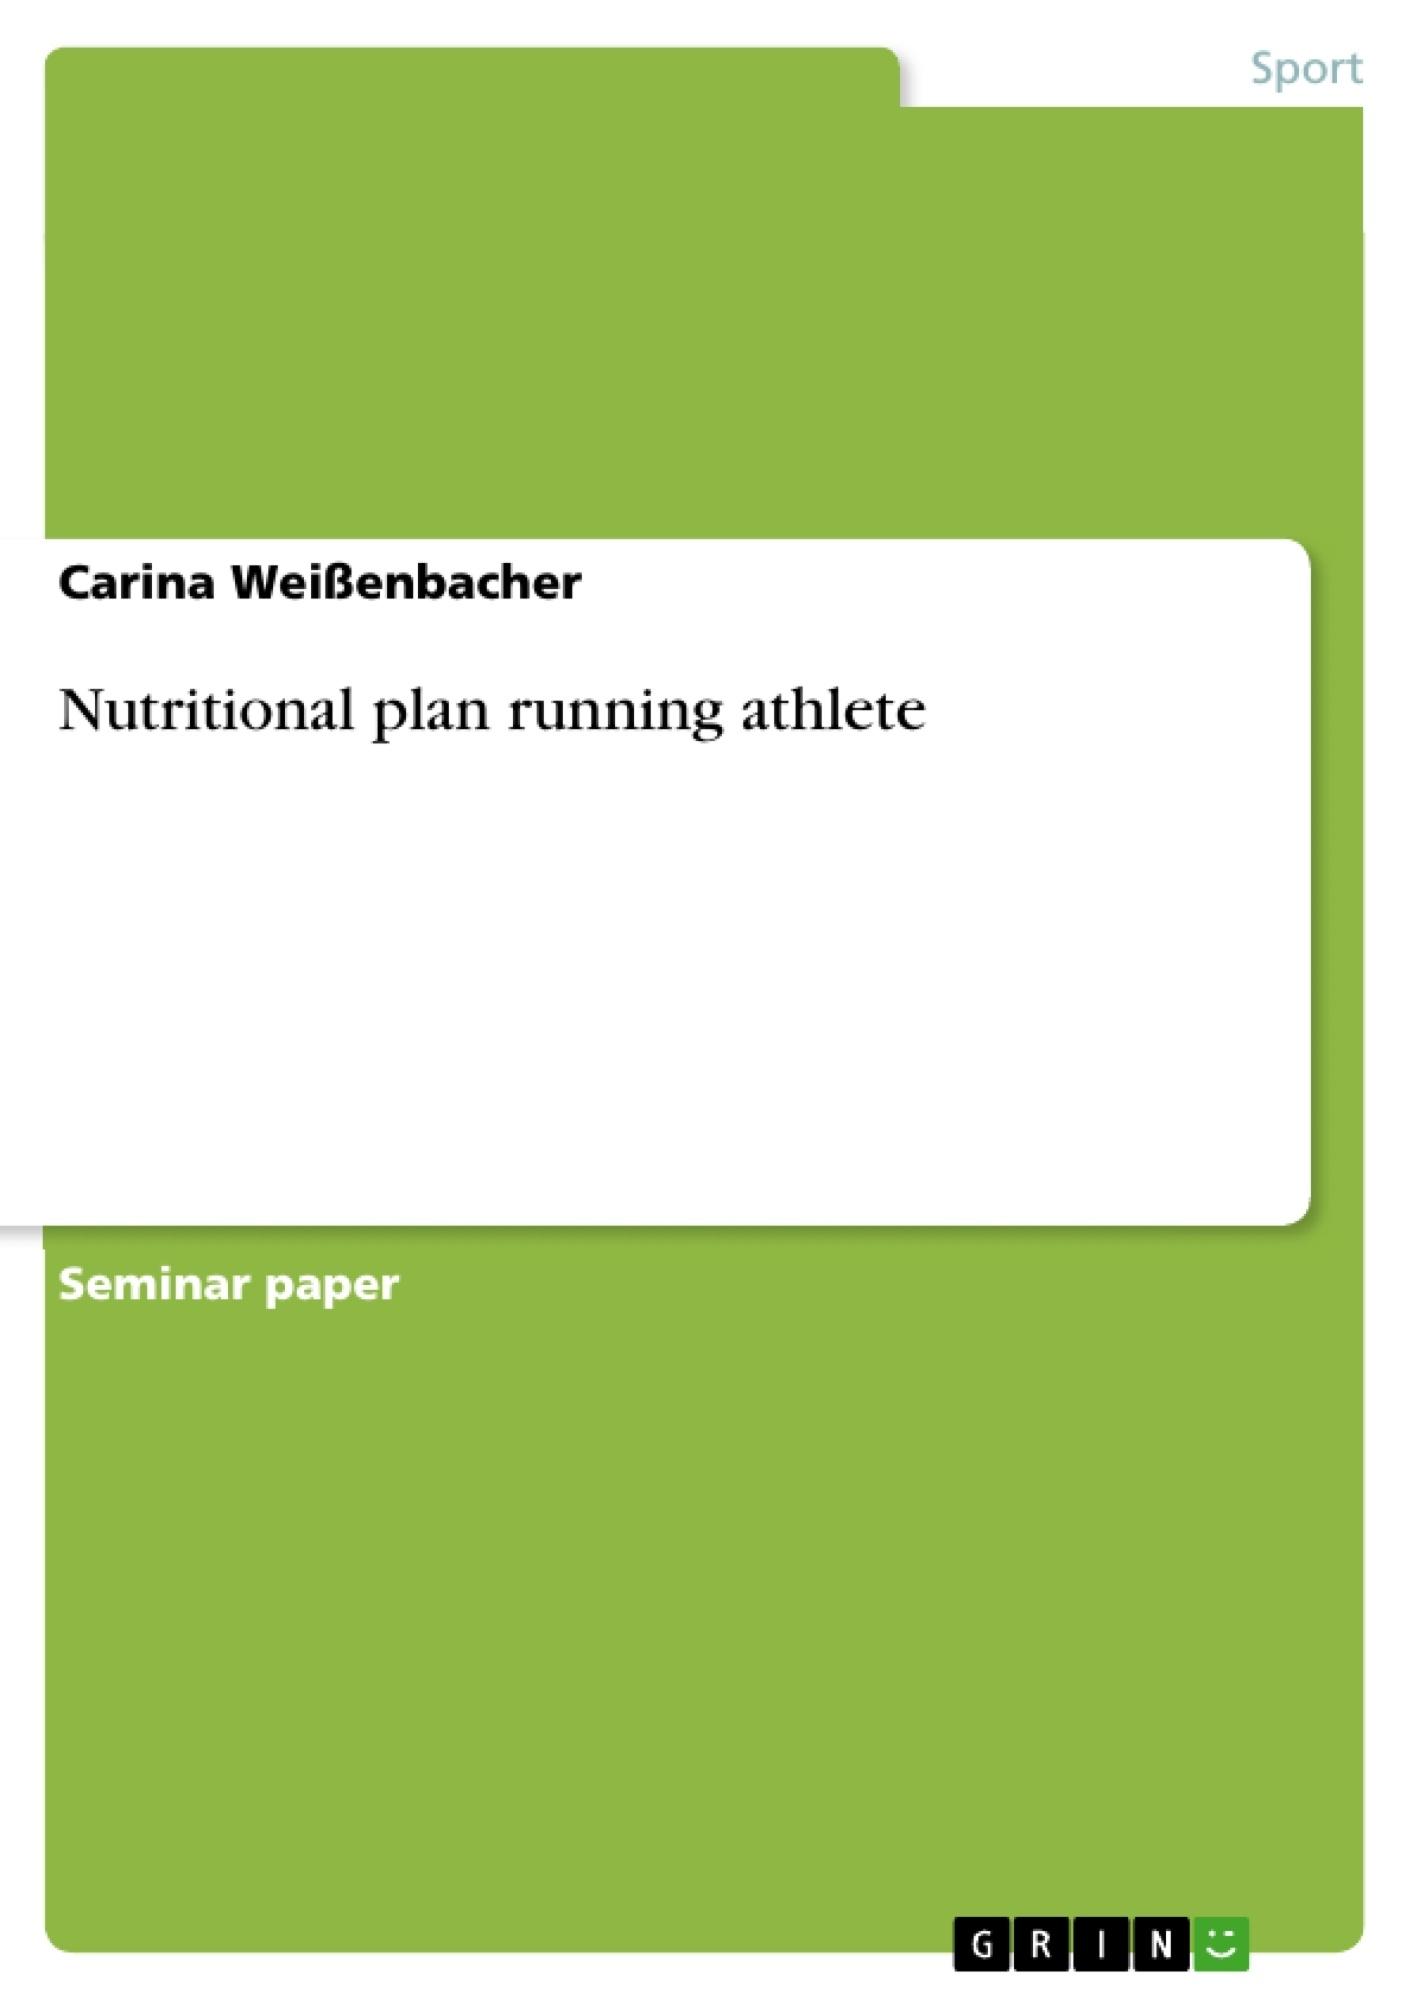 Title: Nutritional plan running athlete